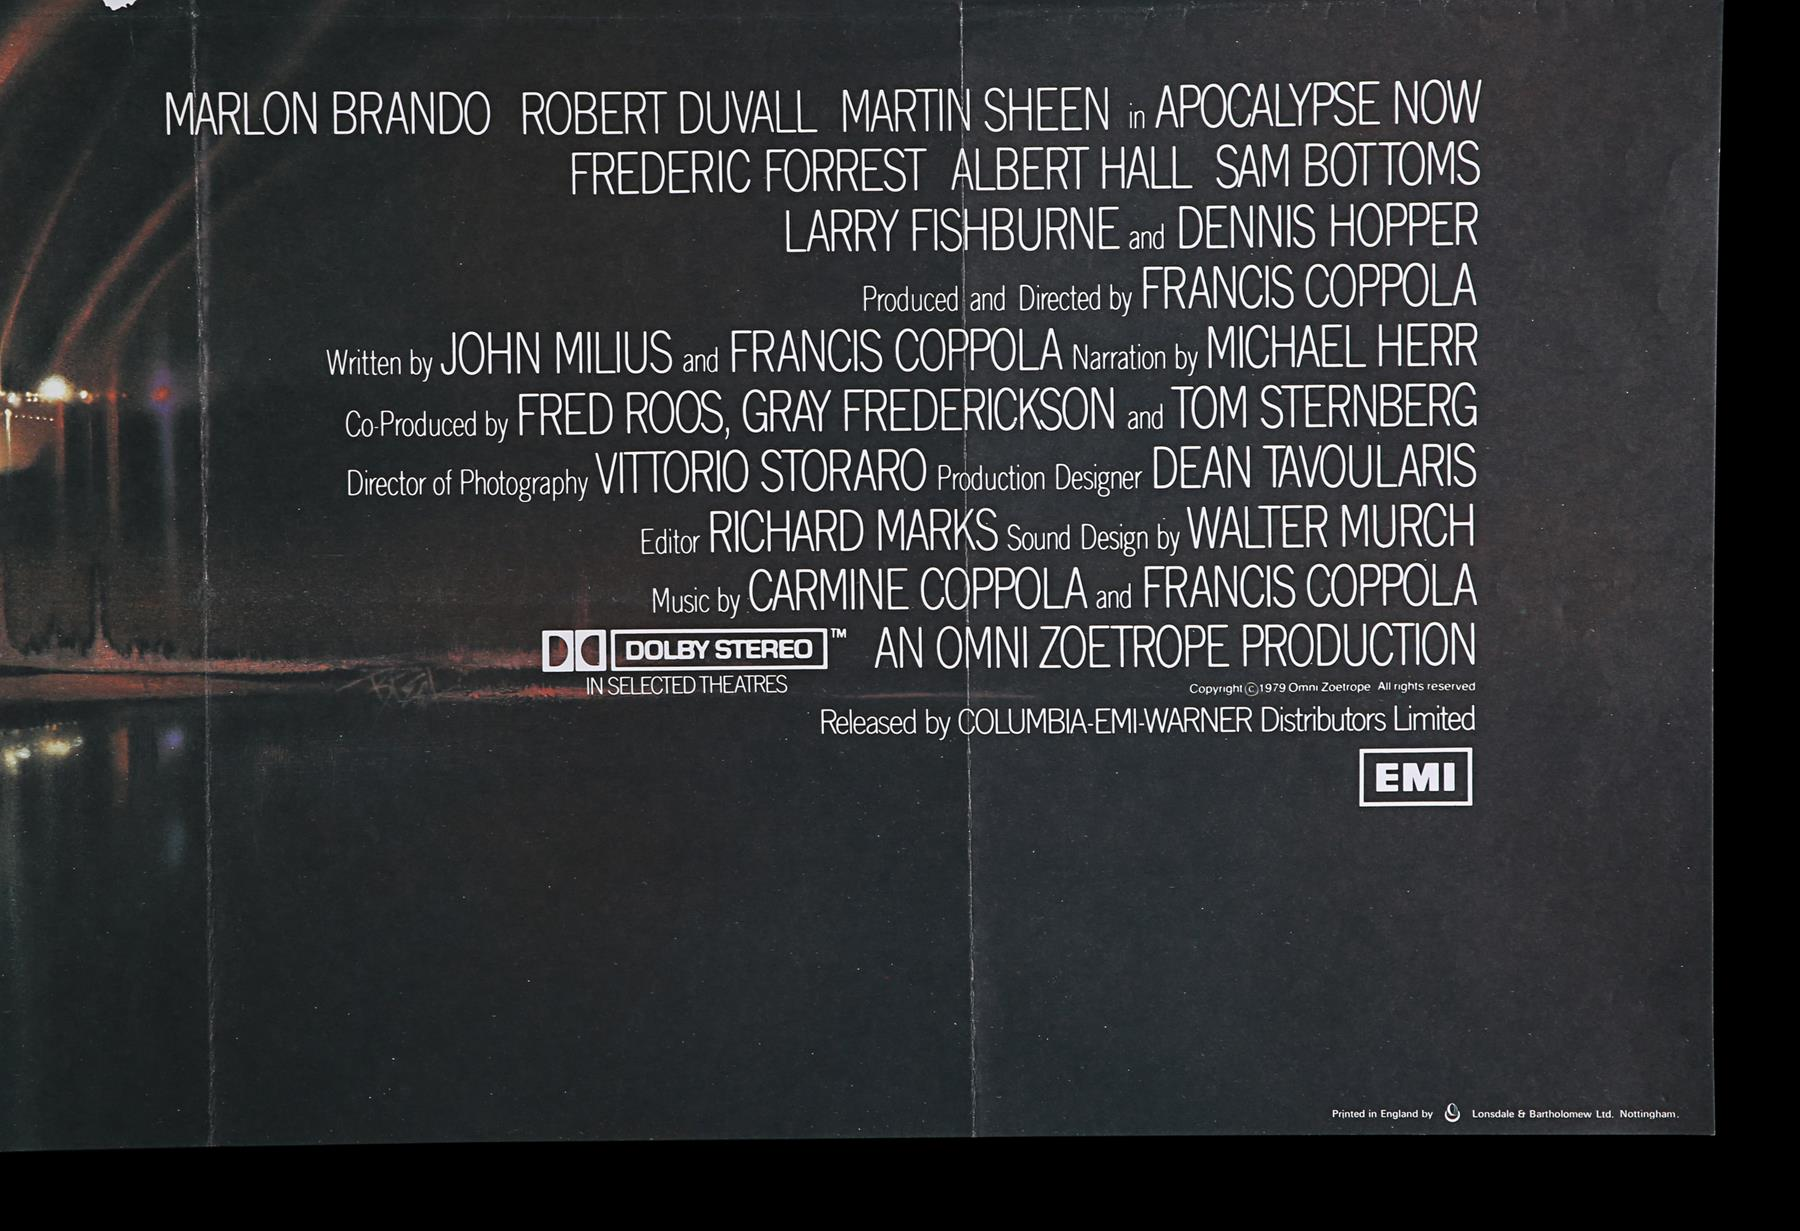 APOCALYPSE NOW (1979) - UK Quad, 1979 - Image 4 of 7